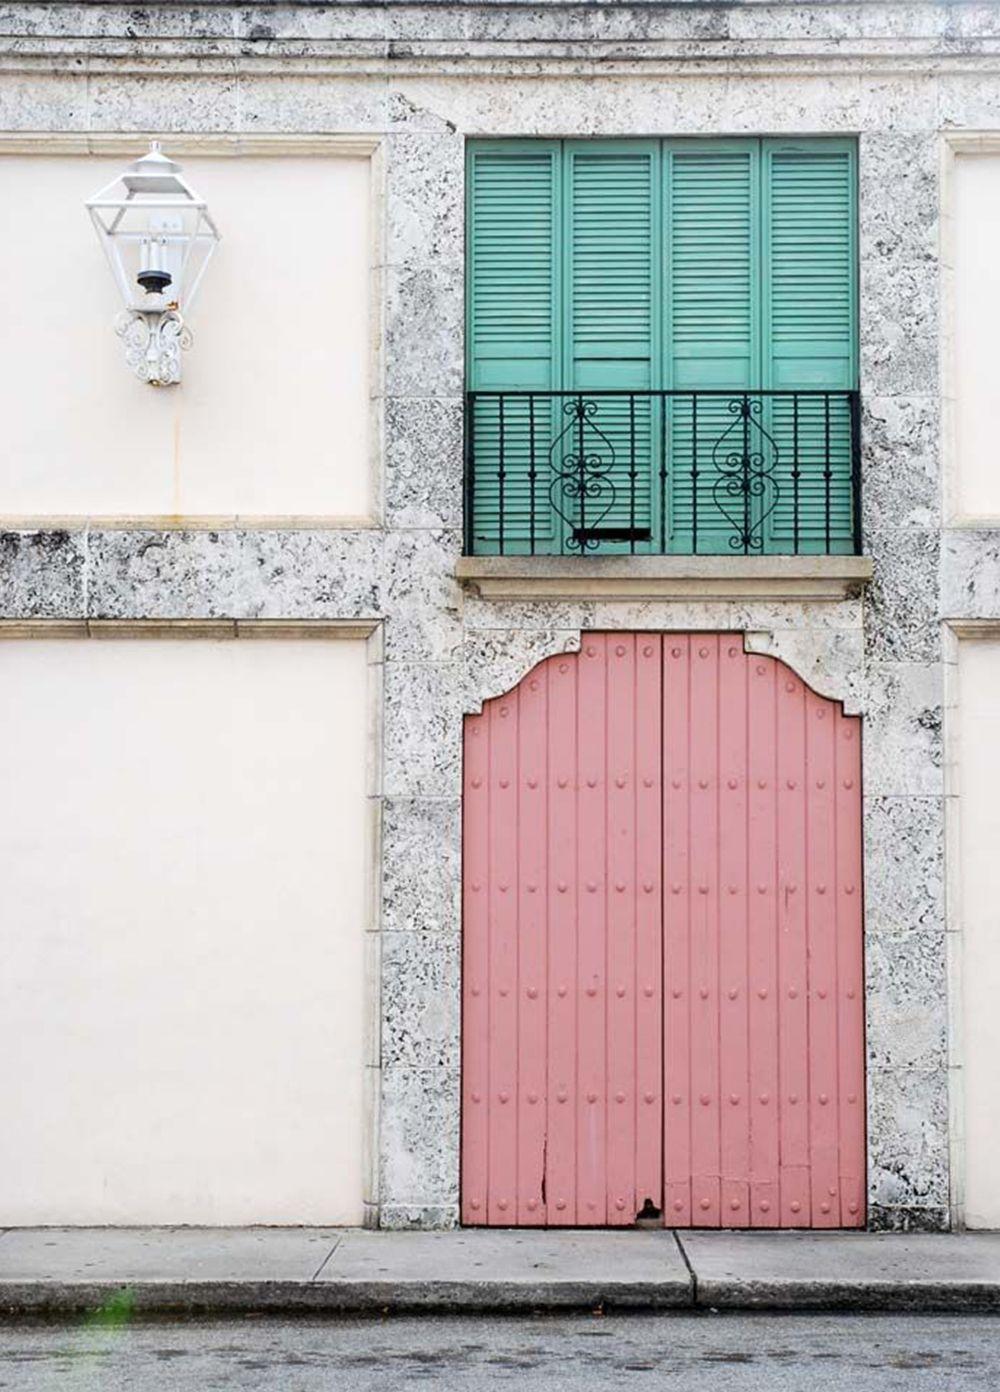 Pin by HÜSEYİN on KAPILAR | Pinterest | Colour contrast, Doors and ...